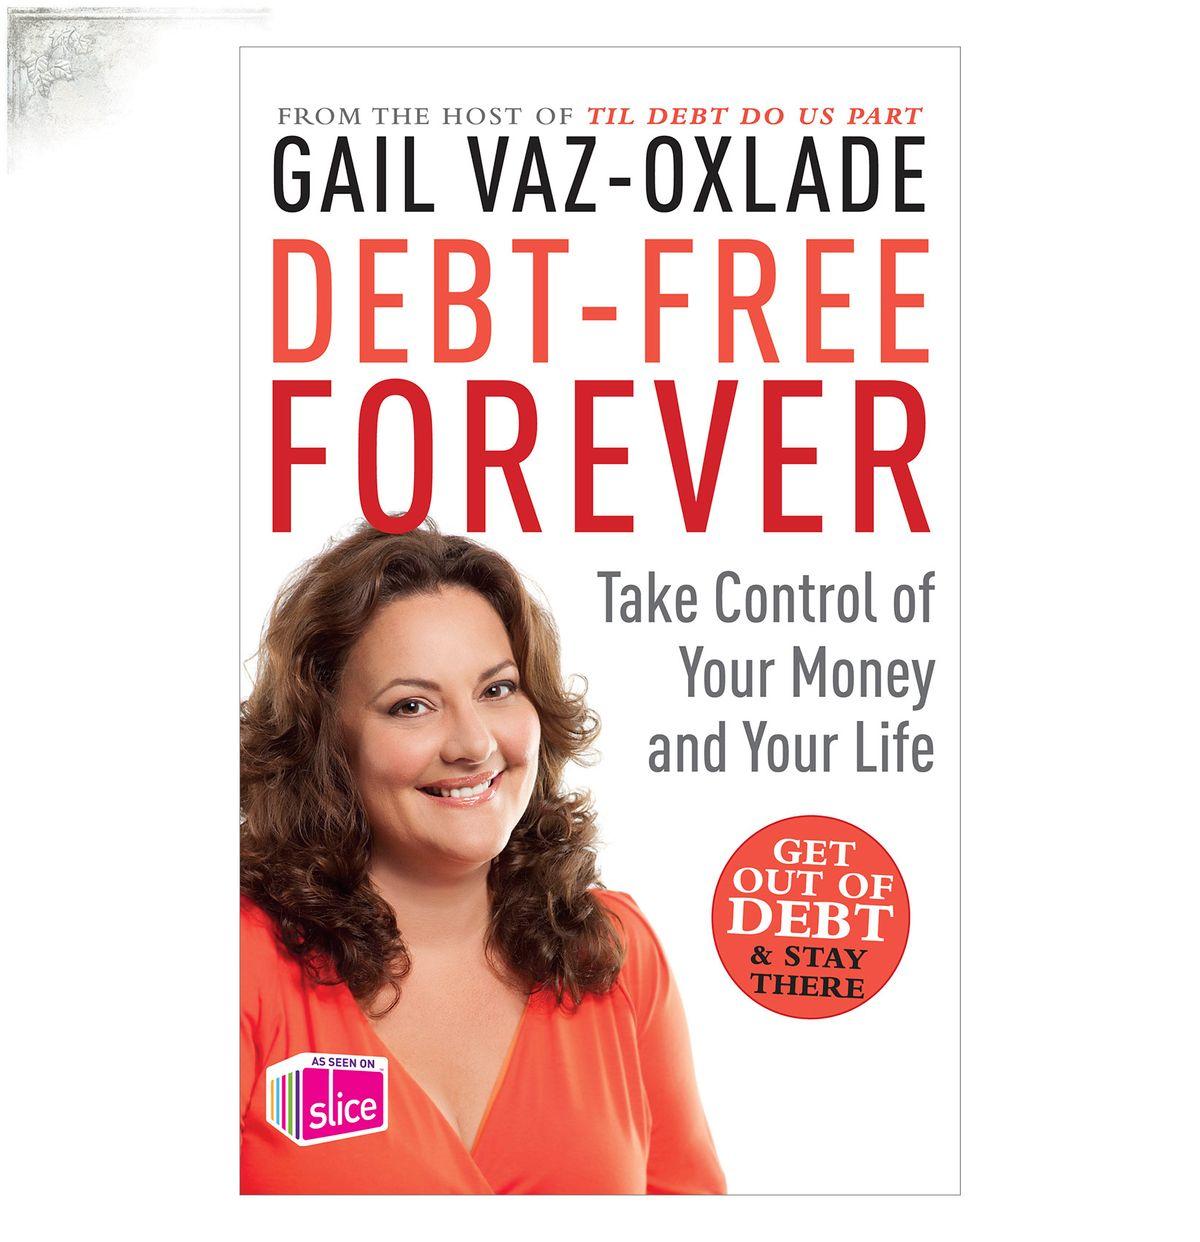 DebtFreePortfPage.jpg